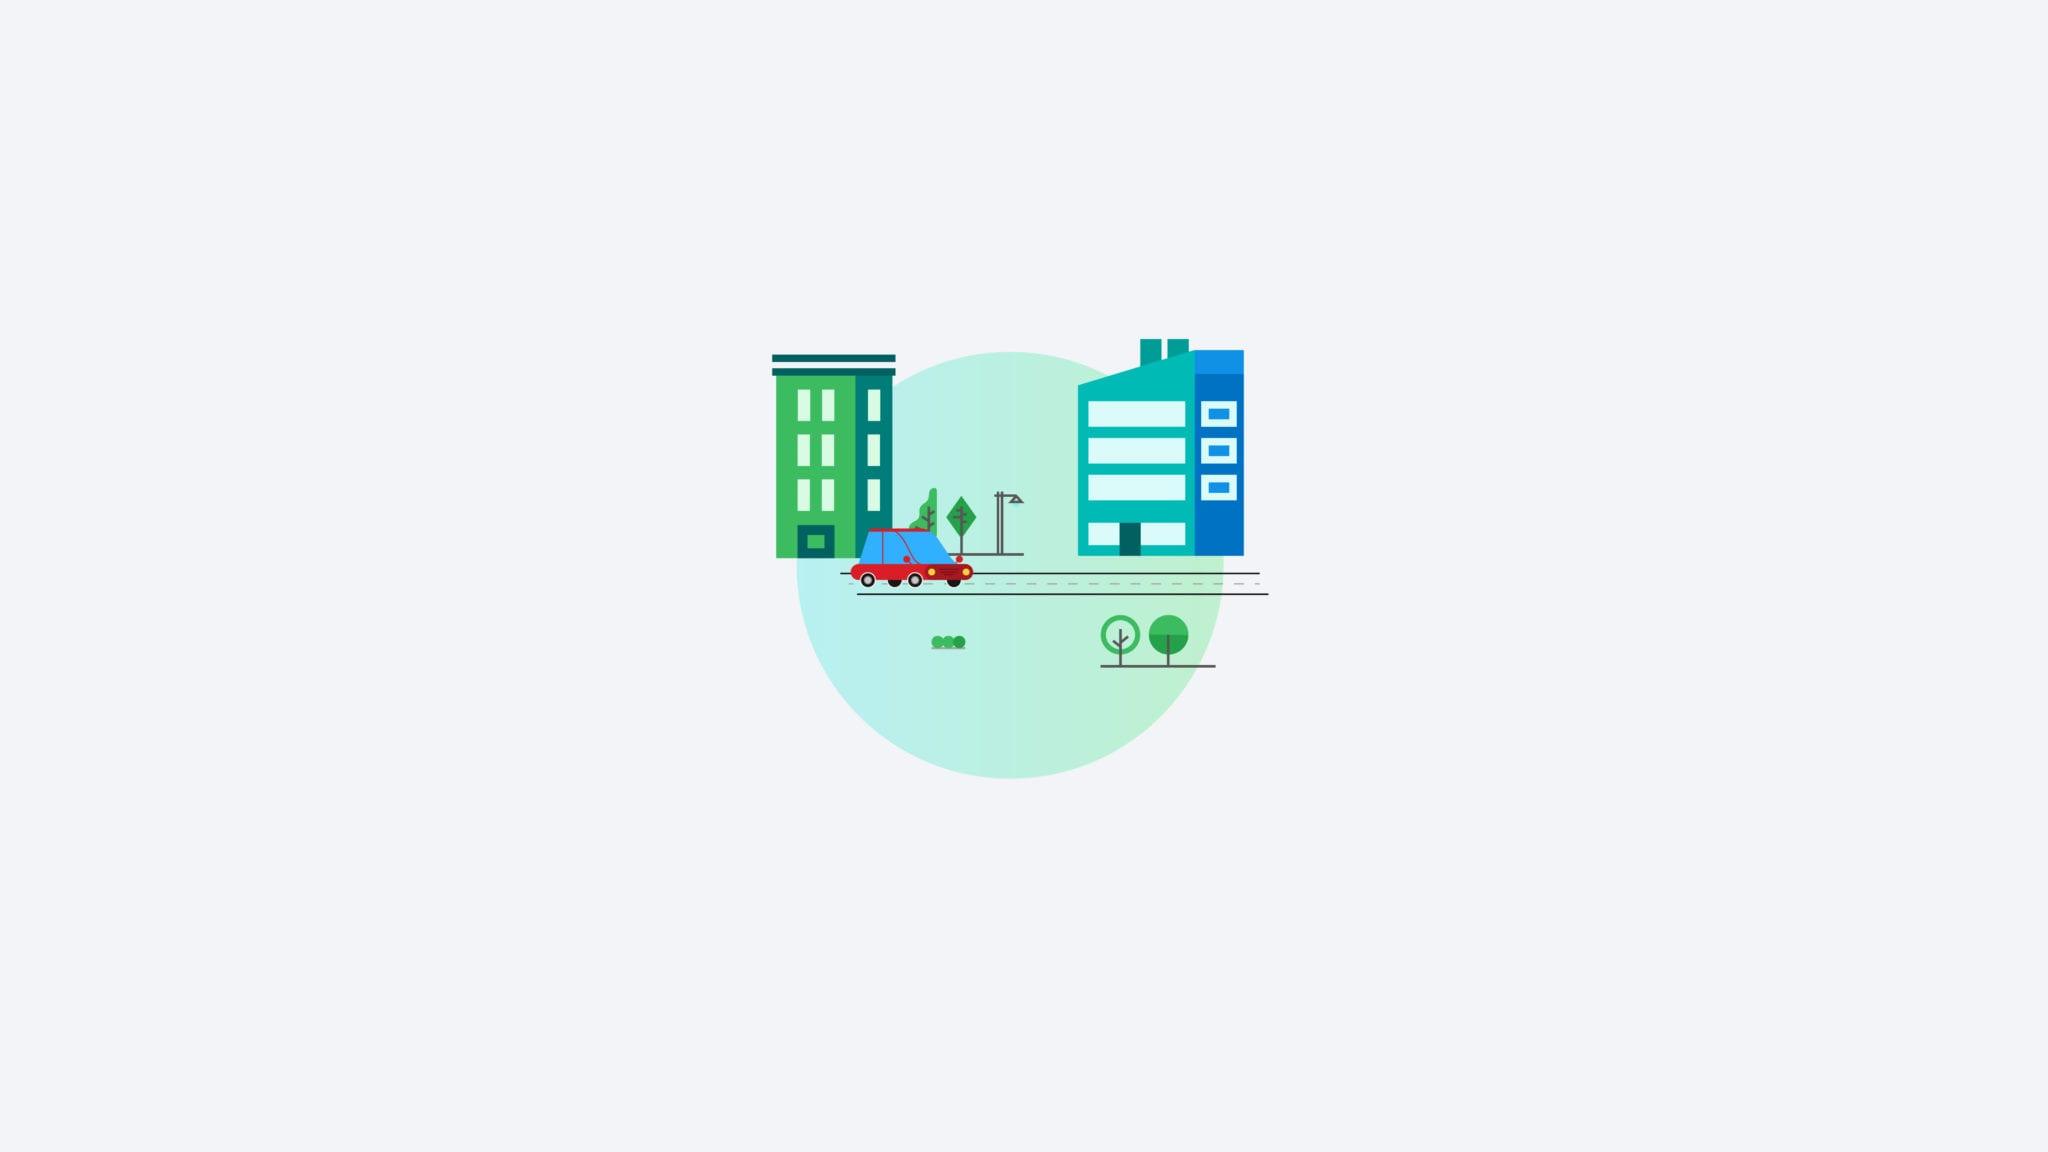 IBM-02-14